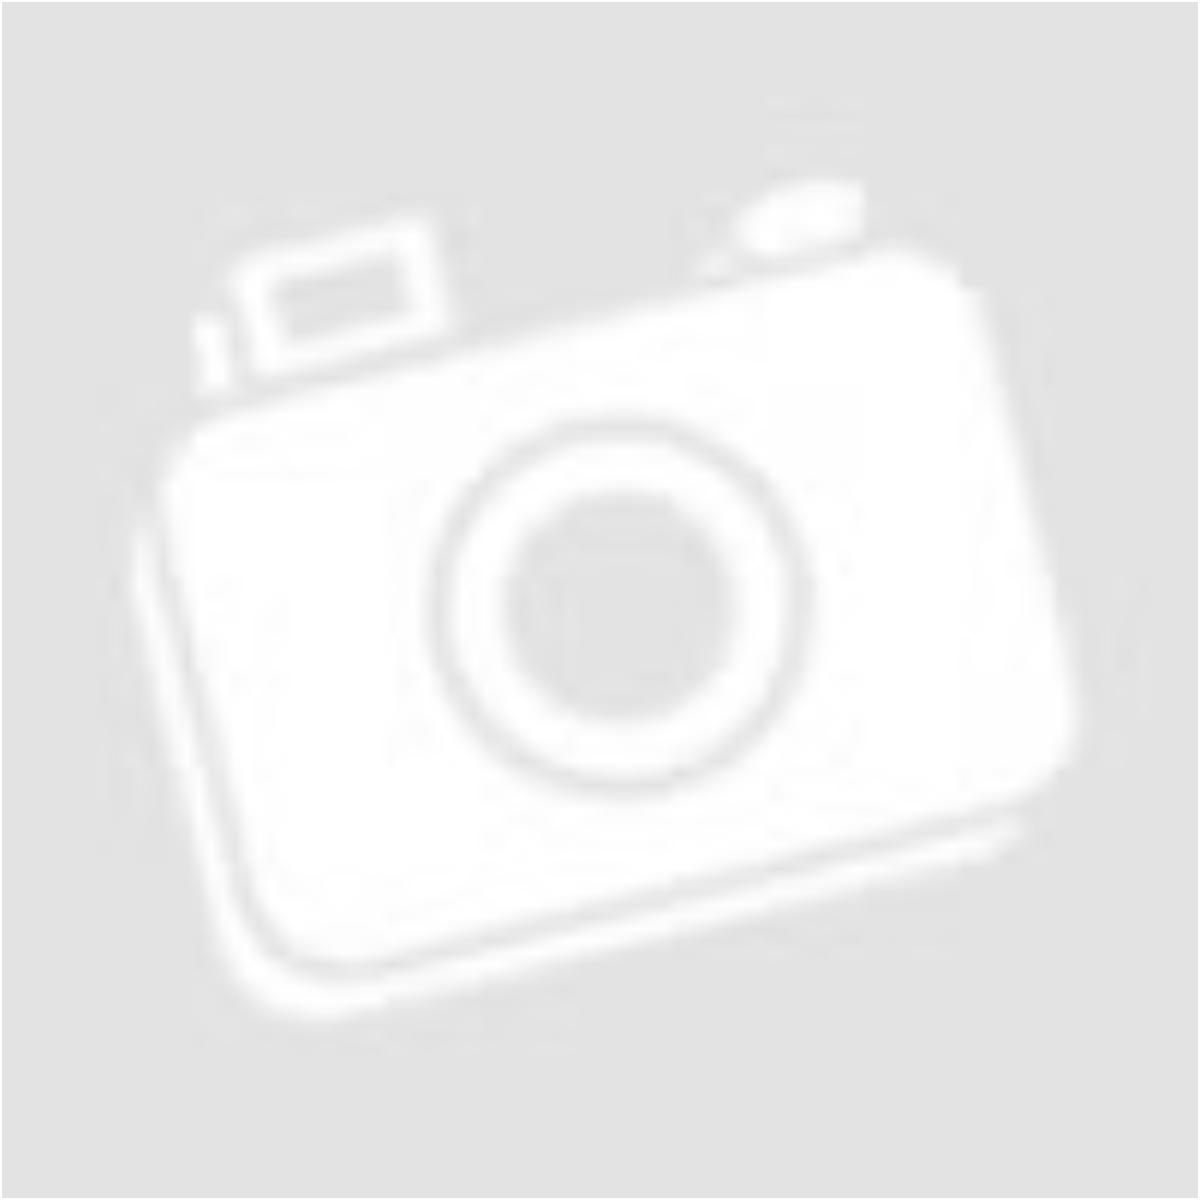 BIANCHI VIA NIRONE 7 DAMA BIANCA - 105 11SP 50/34 kerékpár